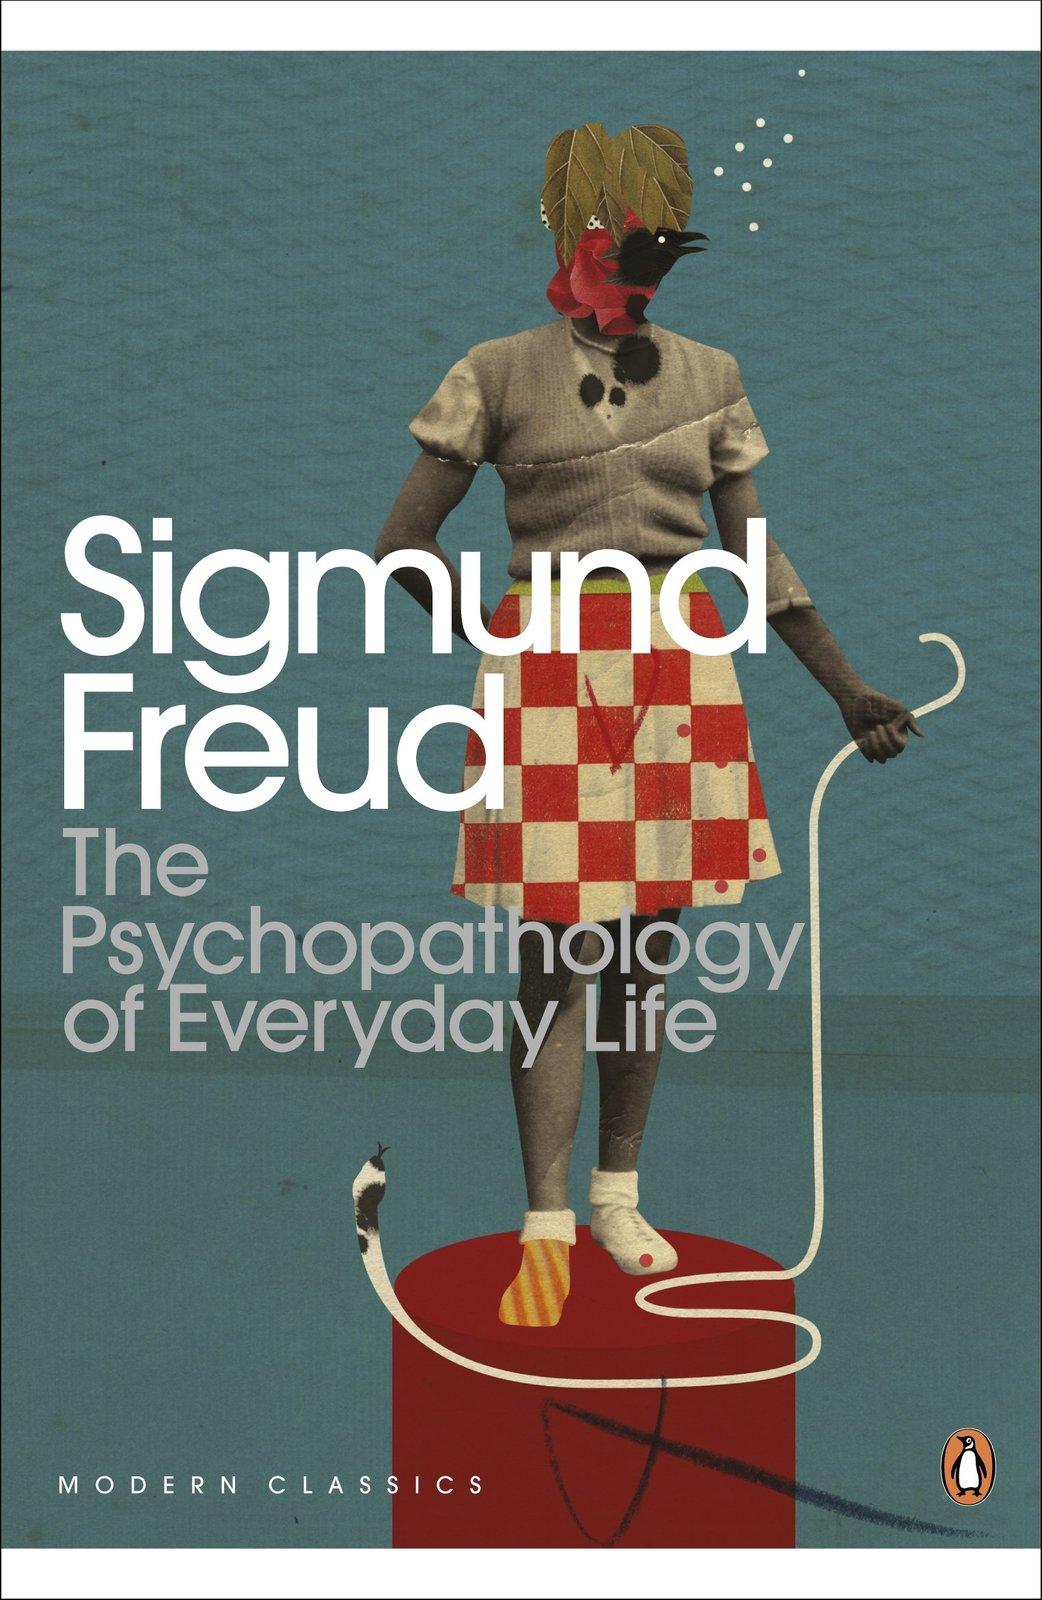 The Psychopathology of Everyday Life by Sigmund Freud image